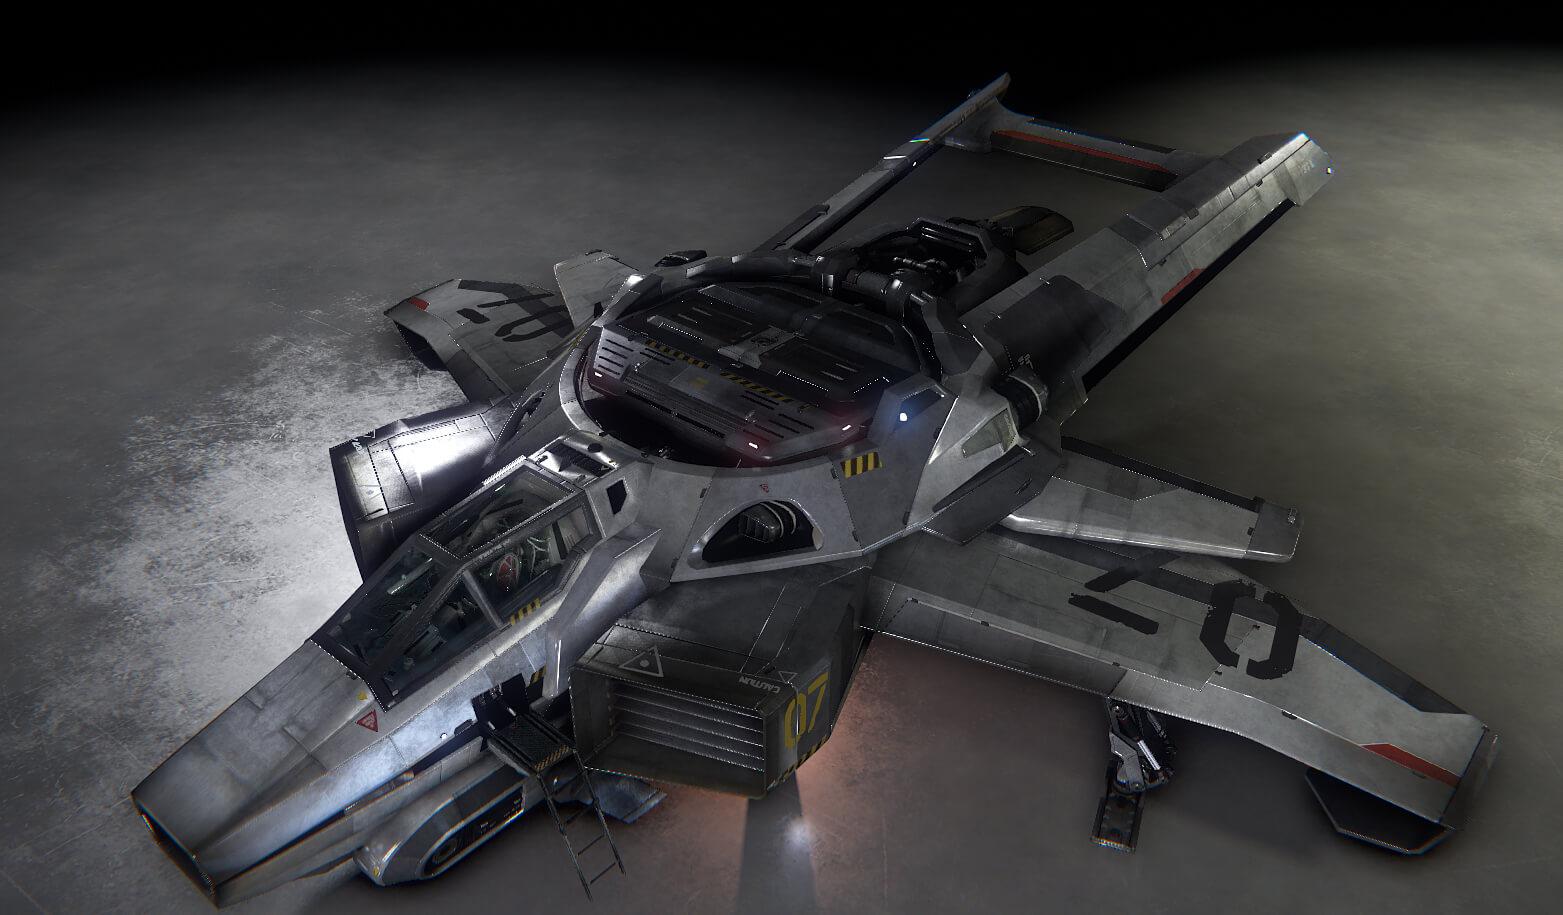 Space Combat Fever: 'Star Citizen' Raises Another Million, 'Enemy Starfighter' Gameplay Trailer